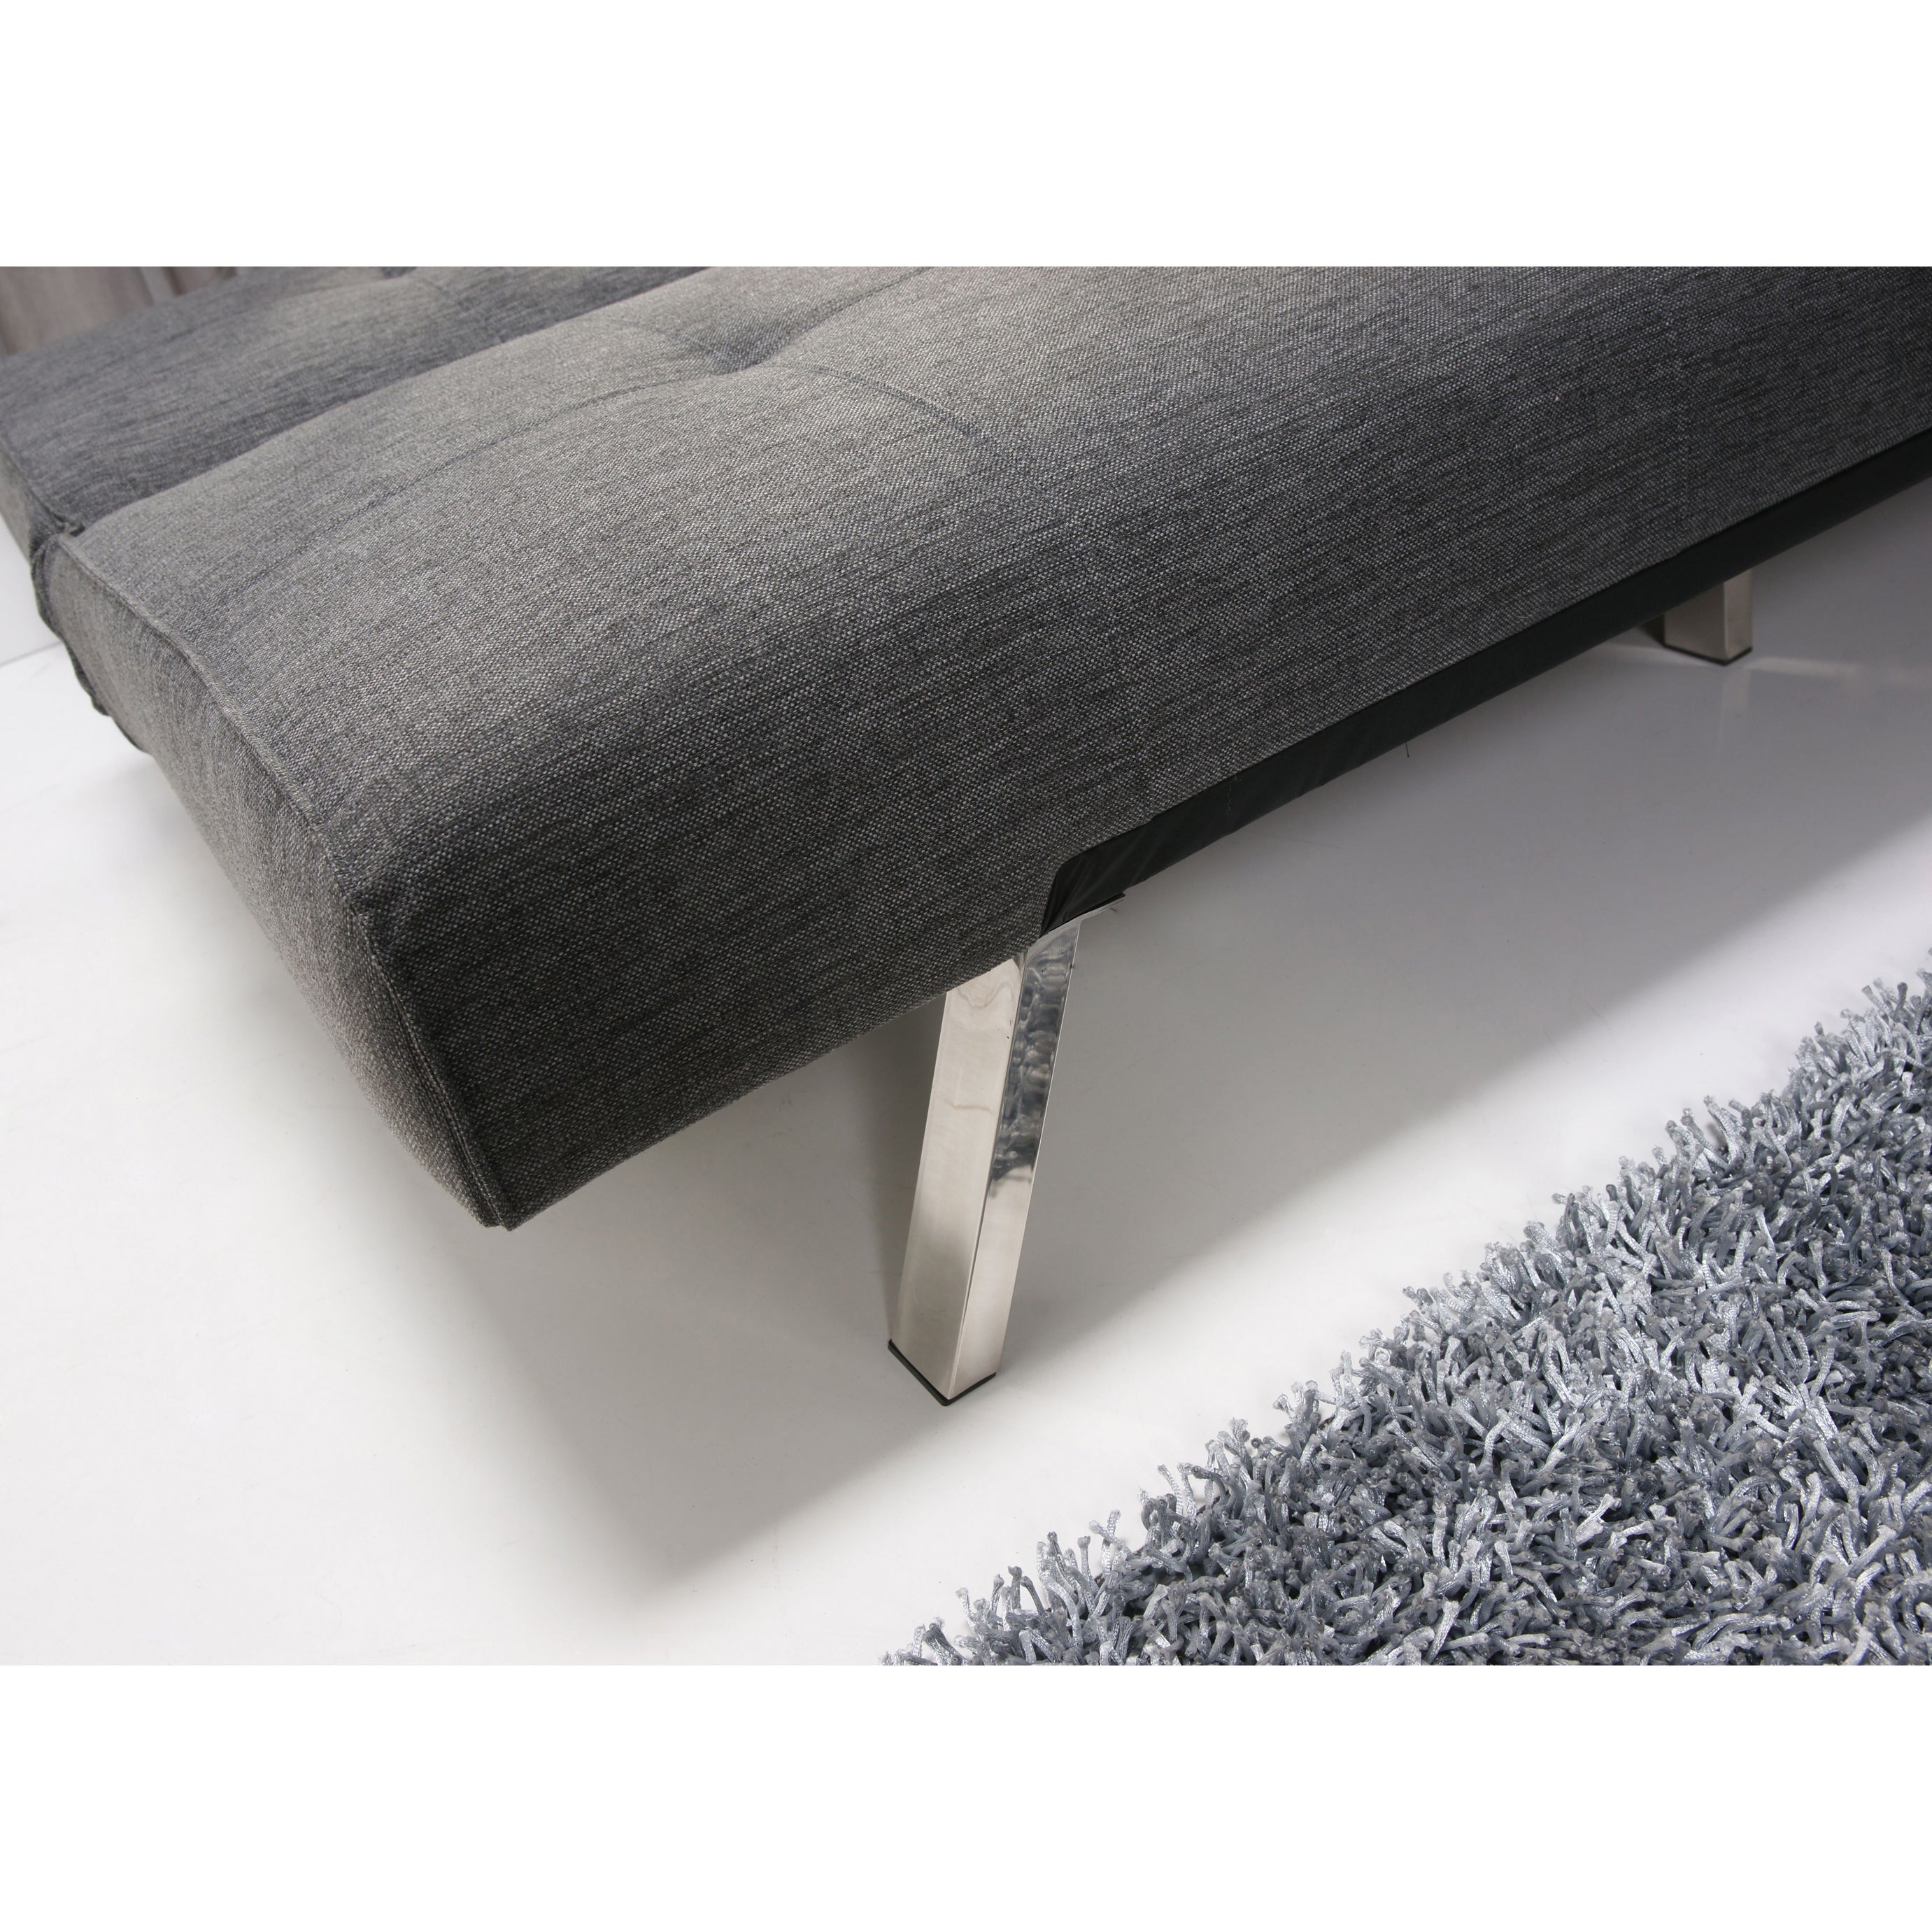 Marvelous Jacksonville Gray Fabric Futon Sleeper Sofa Bed Spiritservingveterans Wood Chair Design Ideas Spiritservingveteransorg